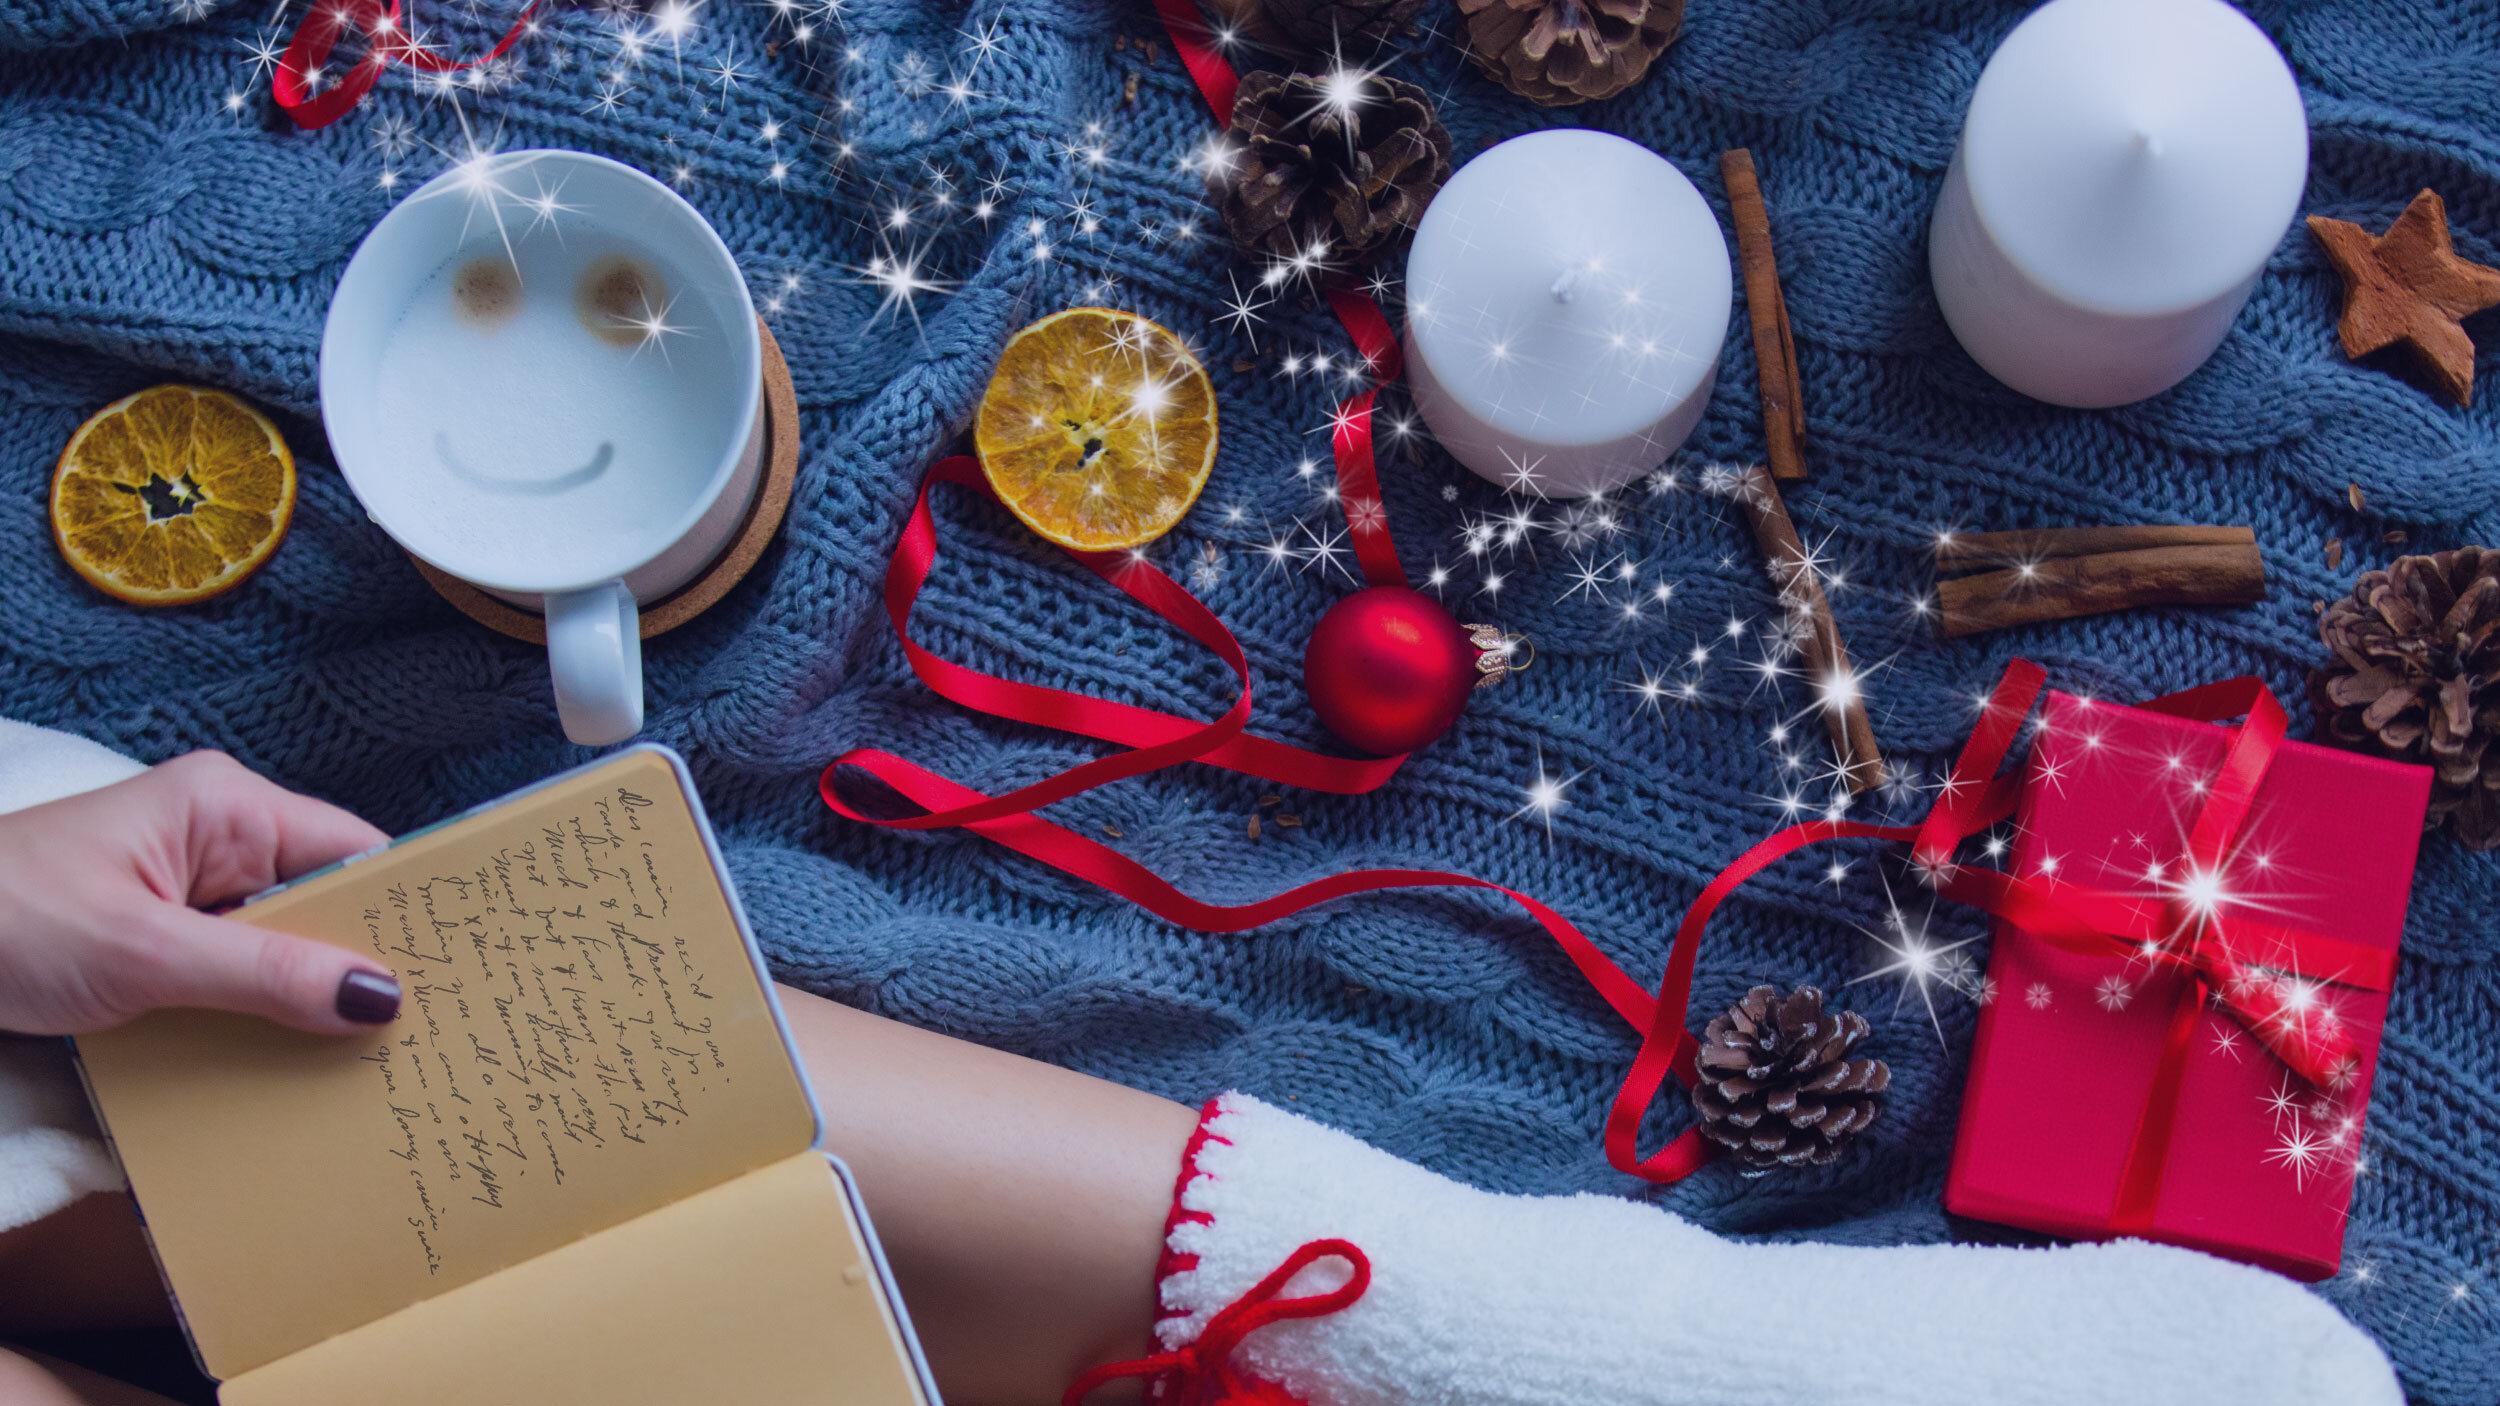 A Happy 'Self-Care' Christmas